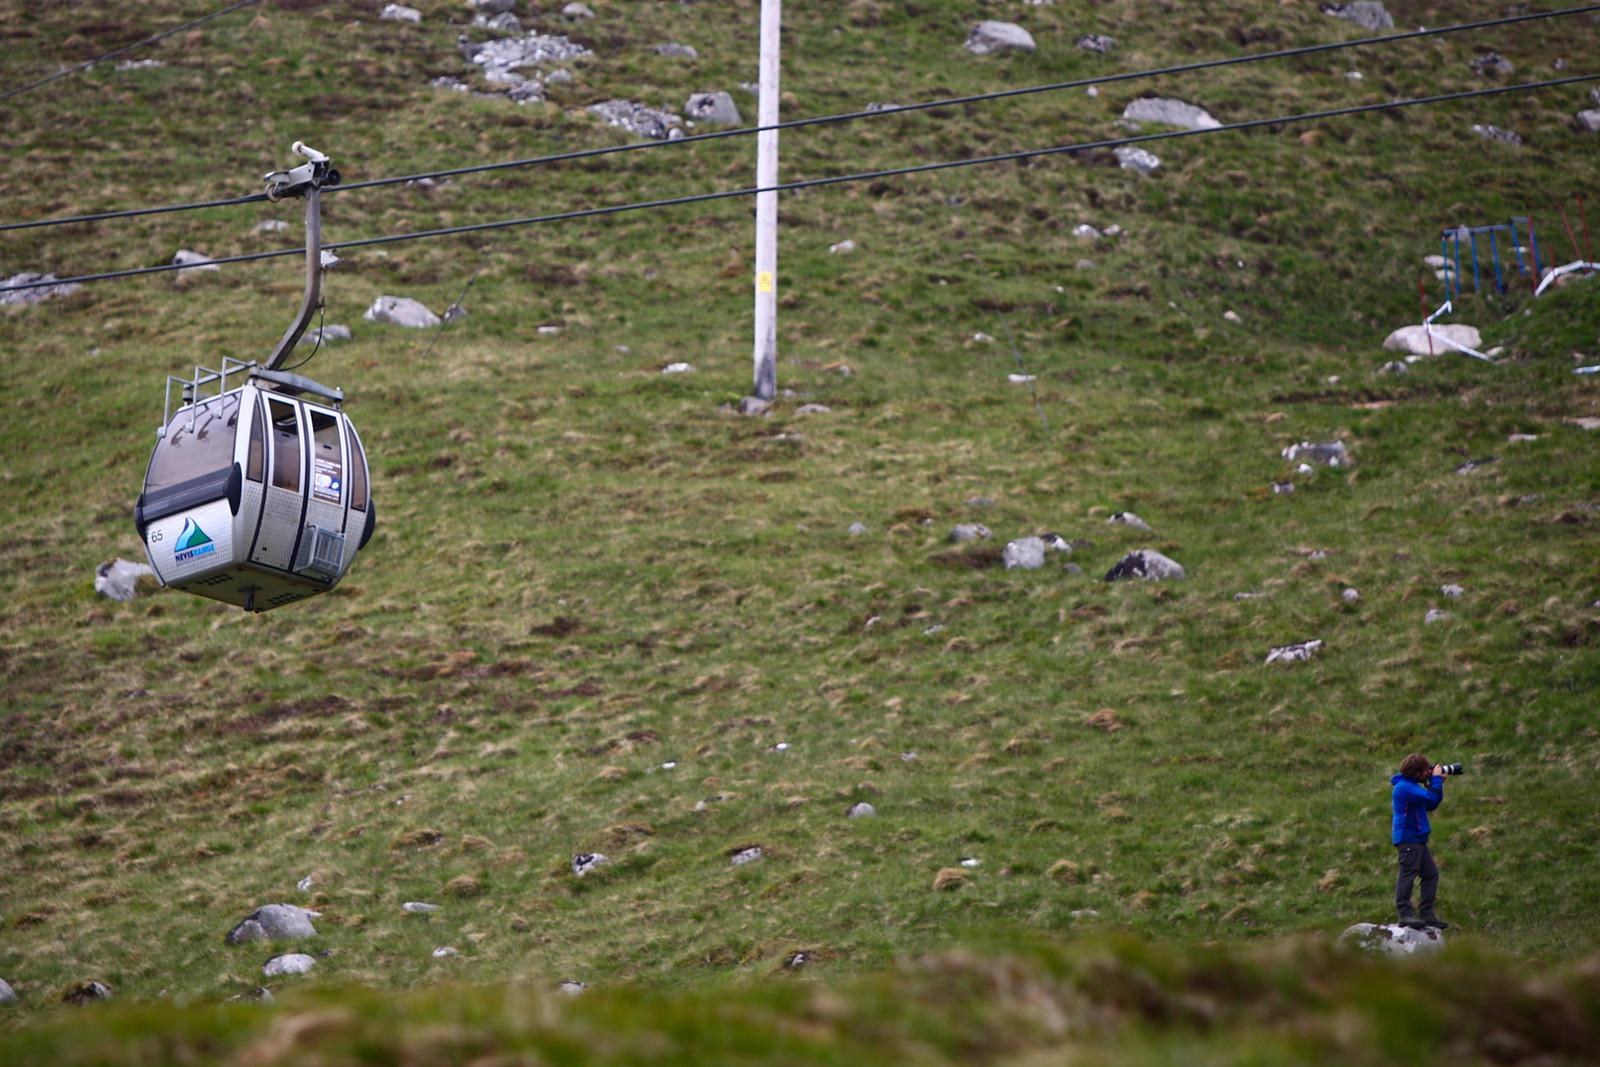 Sebastian Schiek - 2012 UCI World Cup, Fort WIlliam Scotland, Day 1 - Mountain Biking Pictures - Vital MTB